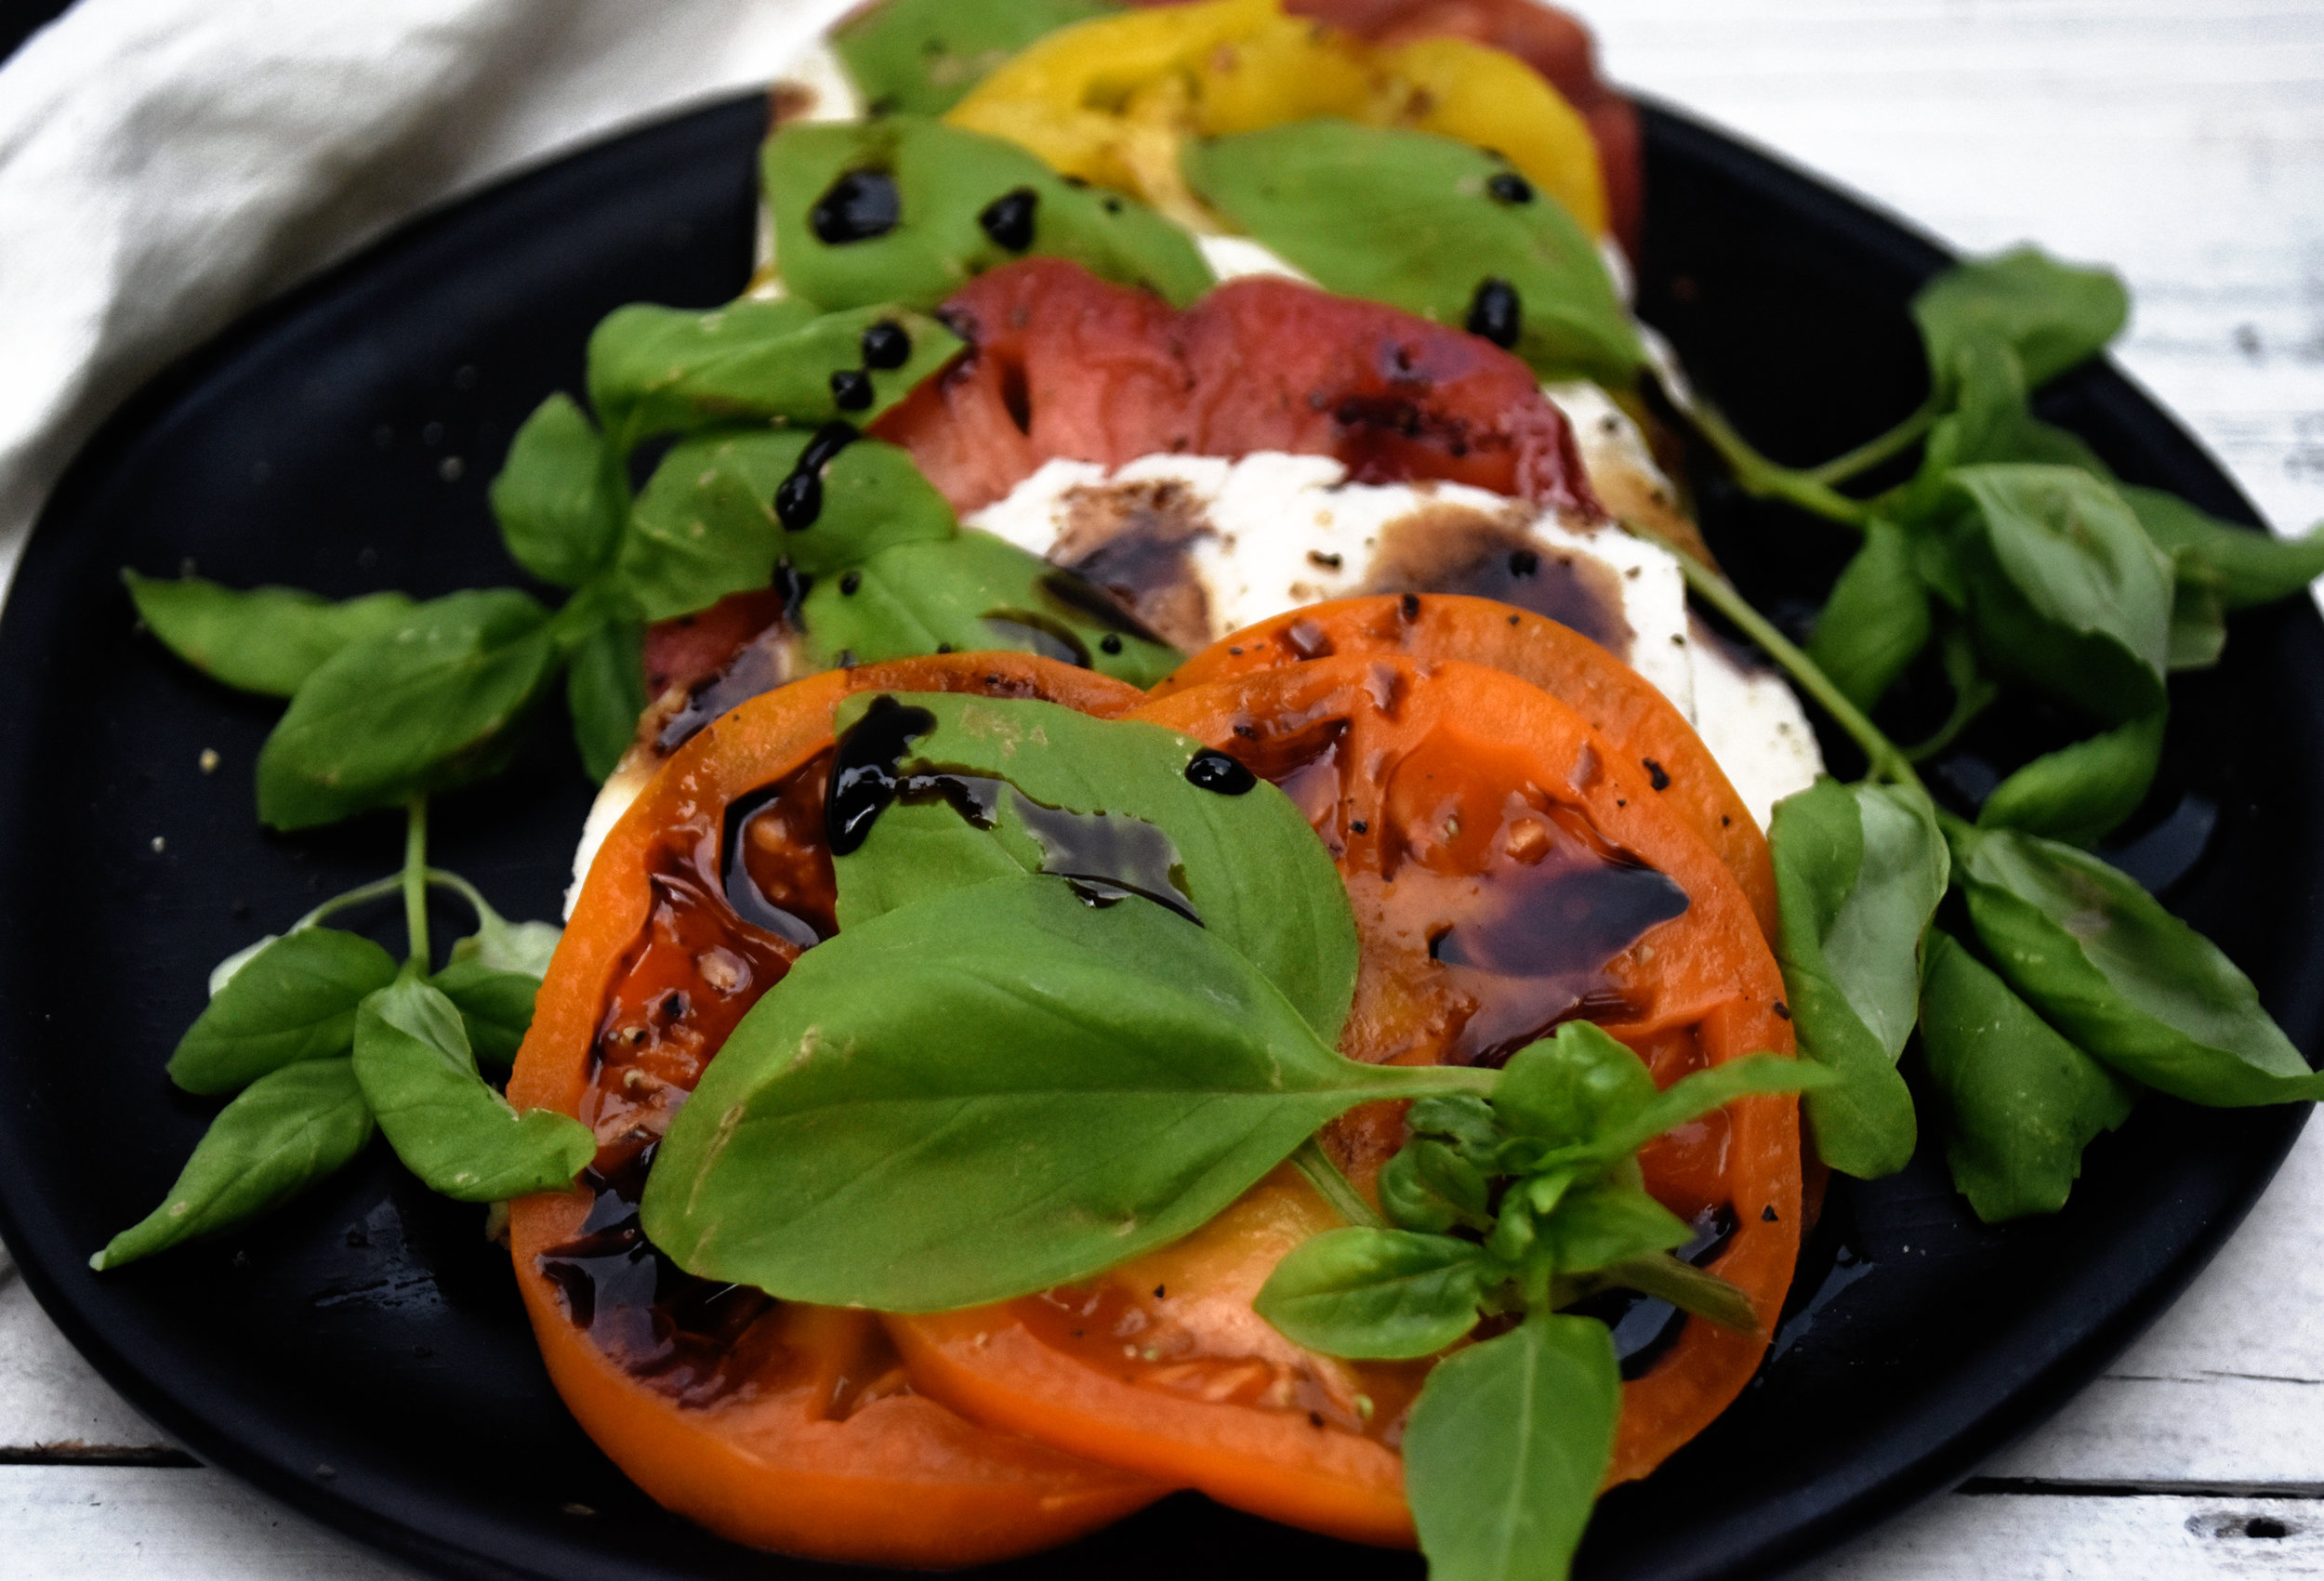 vegan caprese salad with heirloom tomatoes - keep to the simple